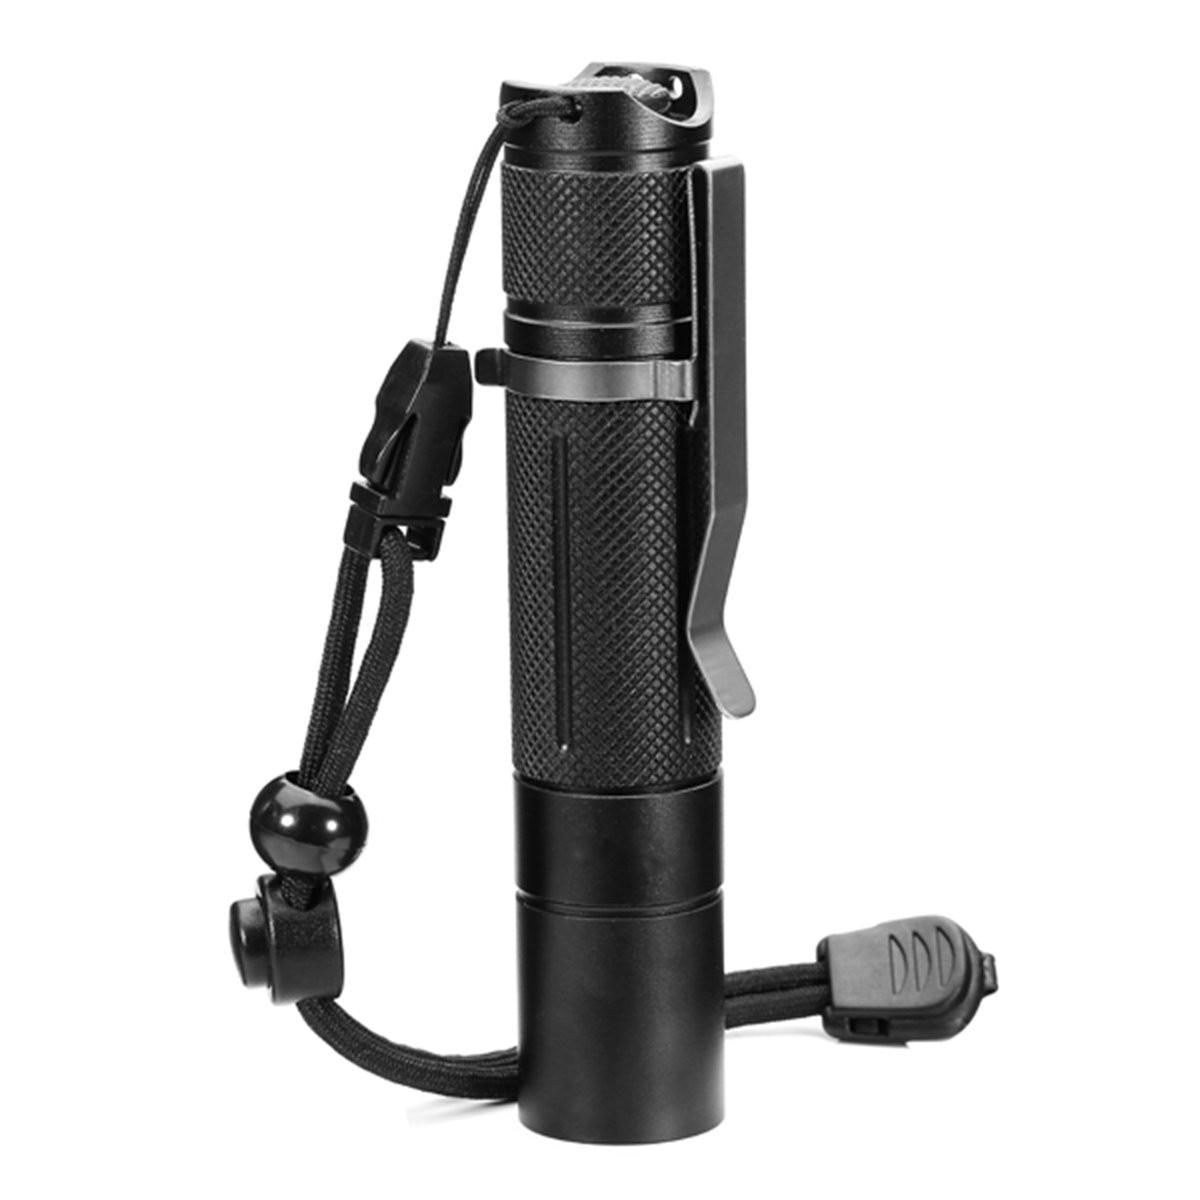 Outdoor XPL 1600Lumens Torch IPX-8 waterproof Lanterns 7/4mo